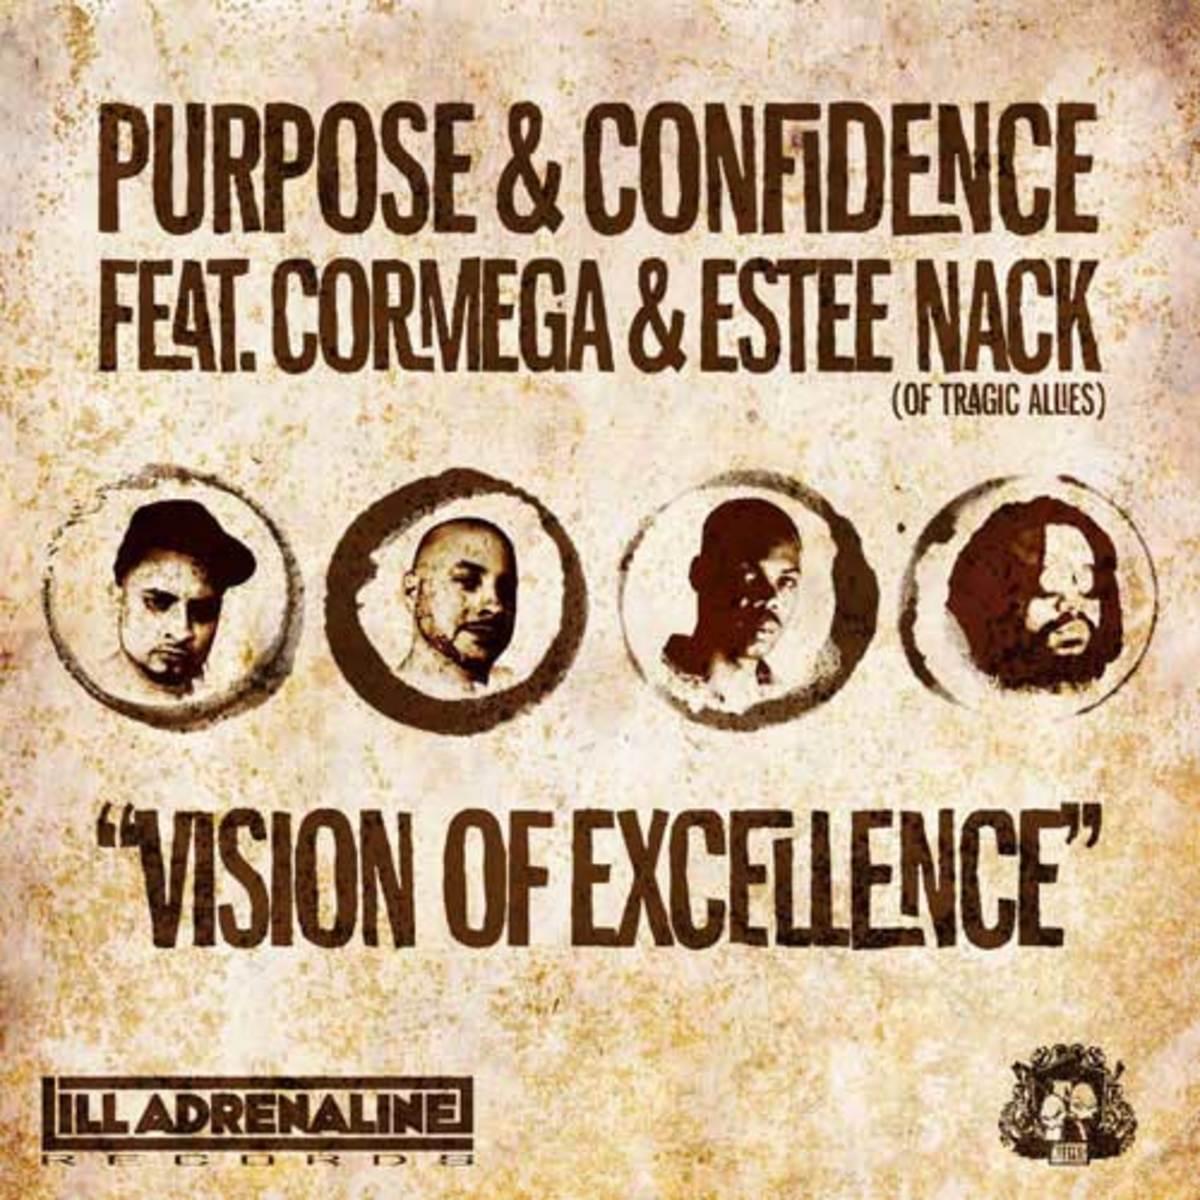 purposeconfidence-vision.jpg